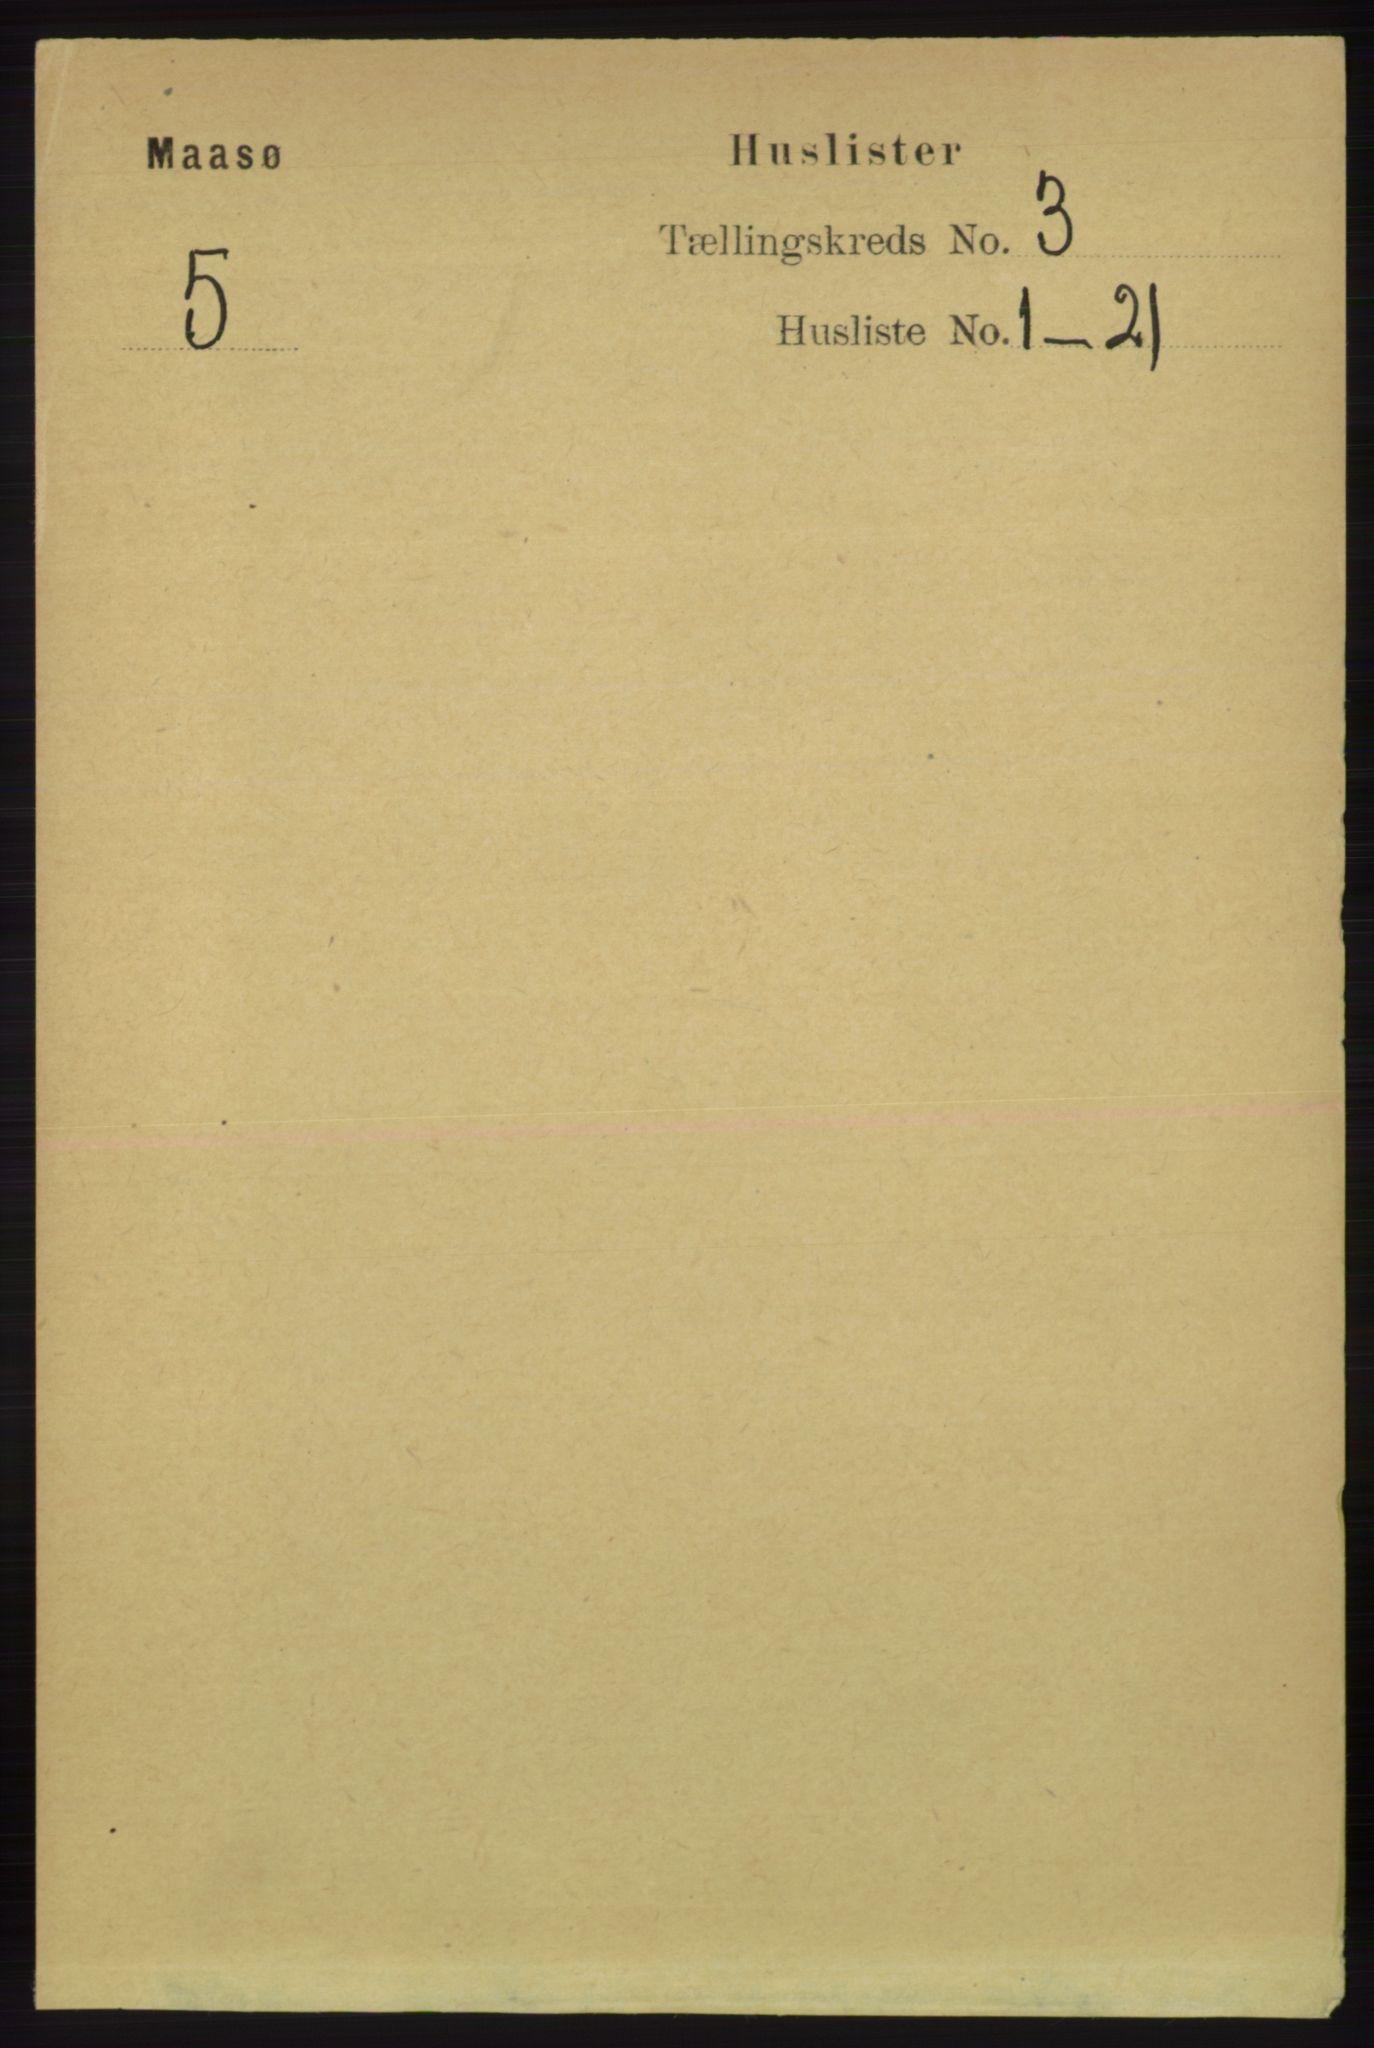 RA, Folketelling 1891 for 2018 Måsøy herred, 1891, s. 361